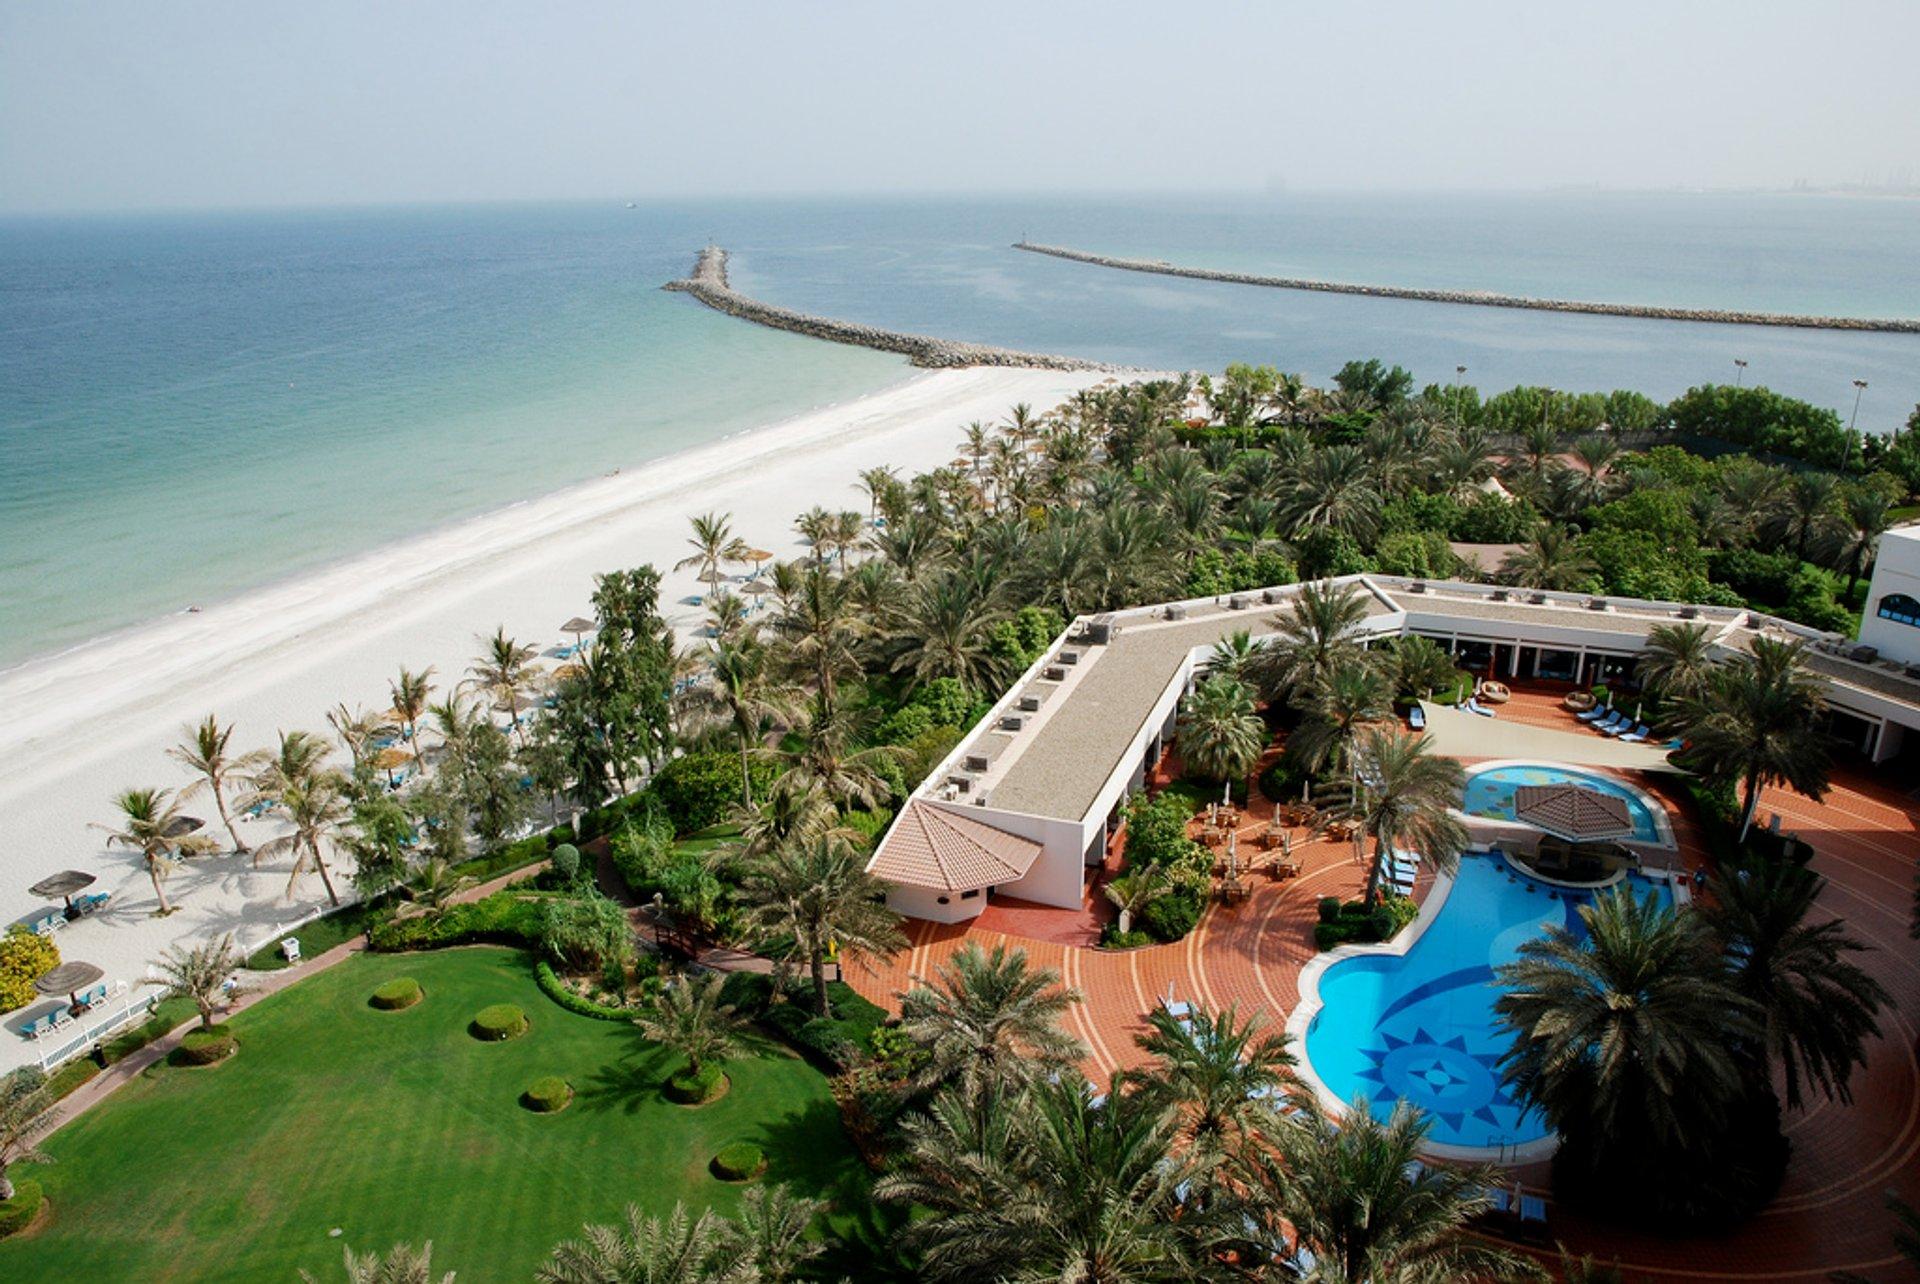 Summer in Dubai 2020 - Best Time